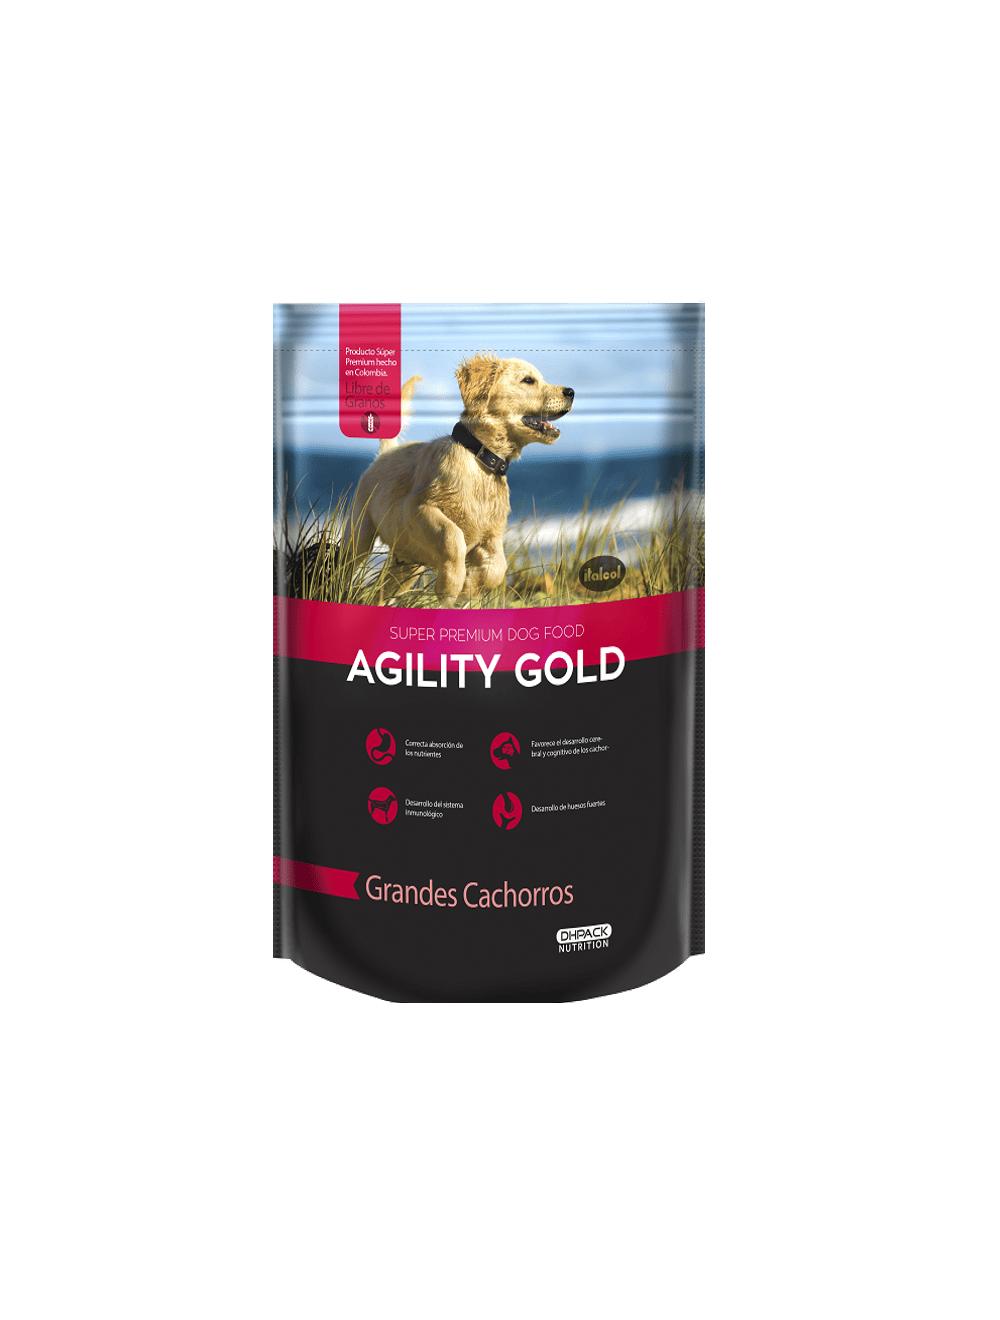 Comida Agility Gold Puppy Large Breed - ciudaddemascotas.com